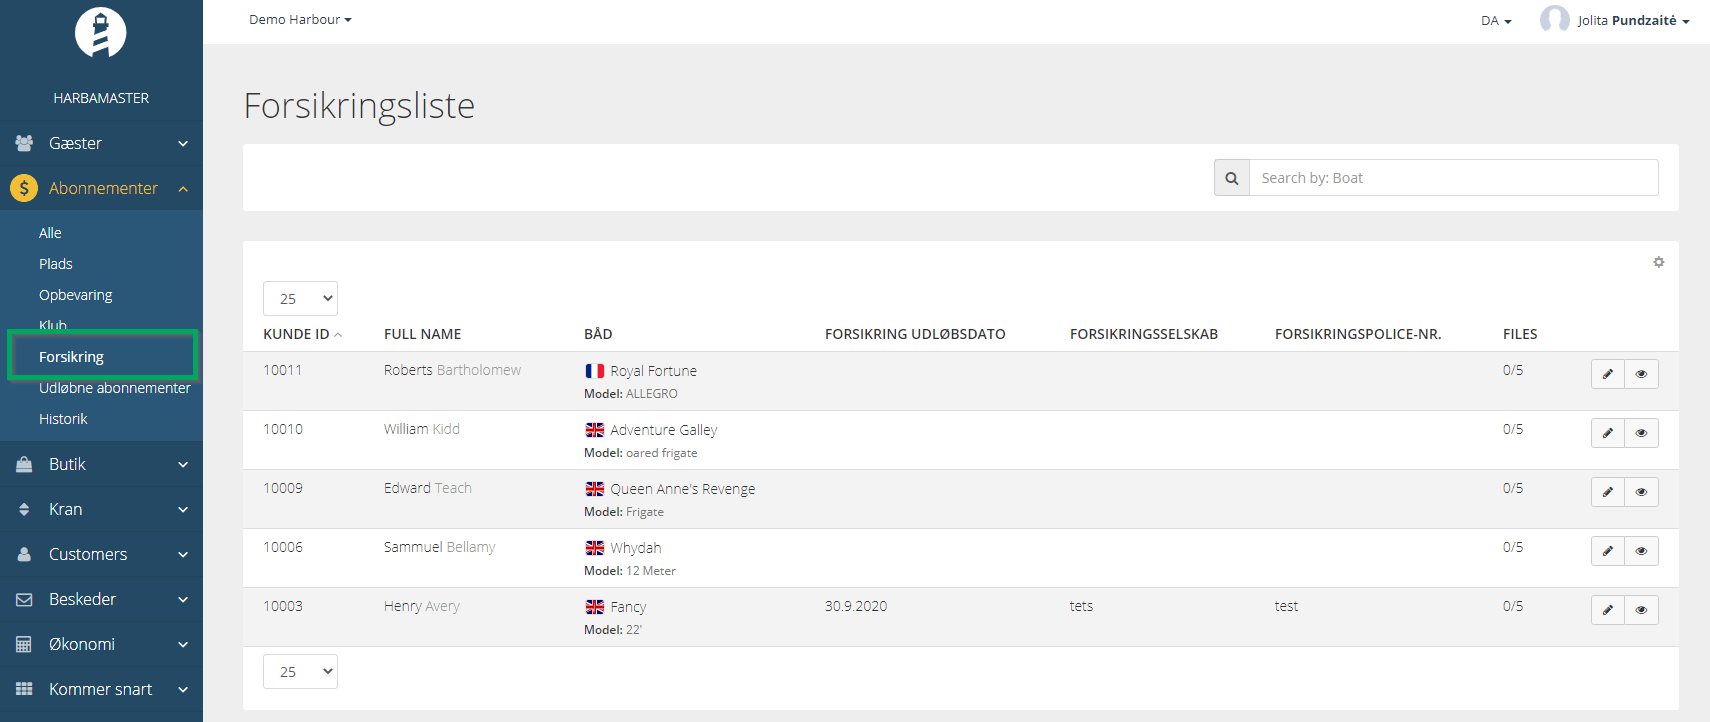 HarbaMaster dashboard screenshot showing Insurance section